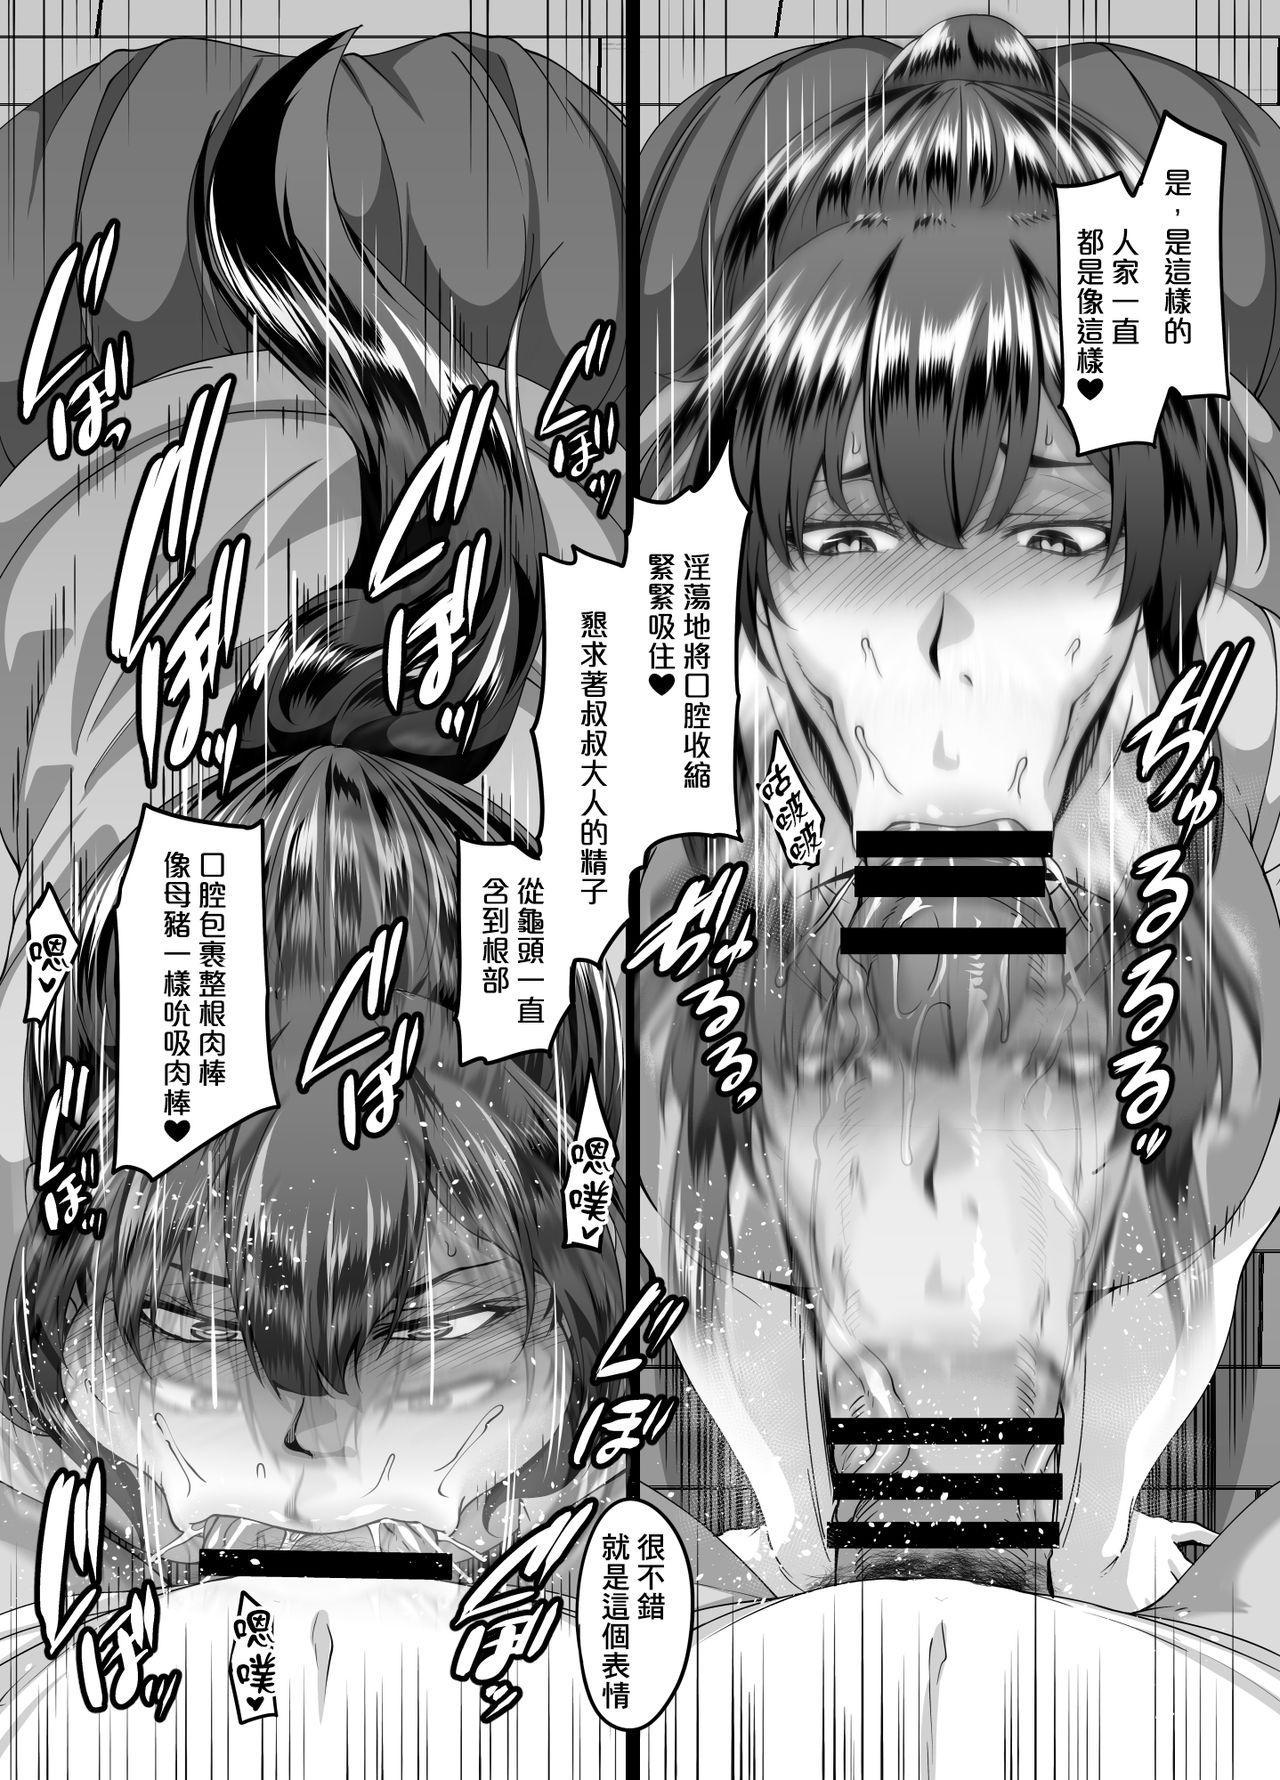 Saimin Nouryoku de Seiso na Ojou-sama Joshigakusei o Juujun na Dosukebe Anal Kurui Onna ni Kaete Anal Sex Zanmai | 用催眠能力將清純的大家閨秀女學生轉變為百依百順超絕下流肛門中毒女之後的無節制肛門性交 8